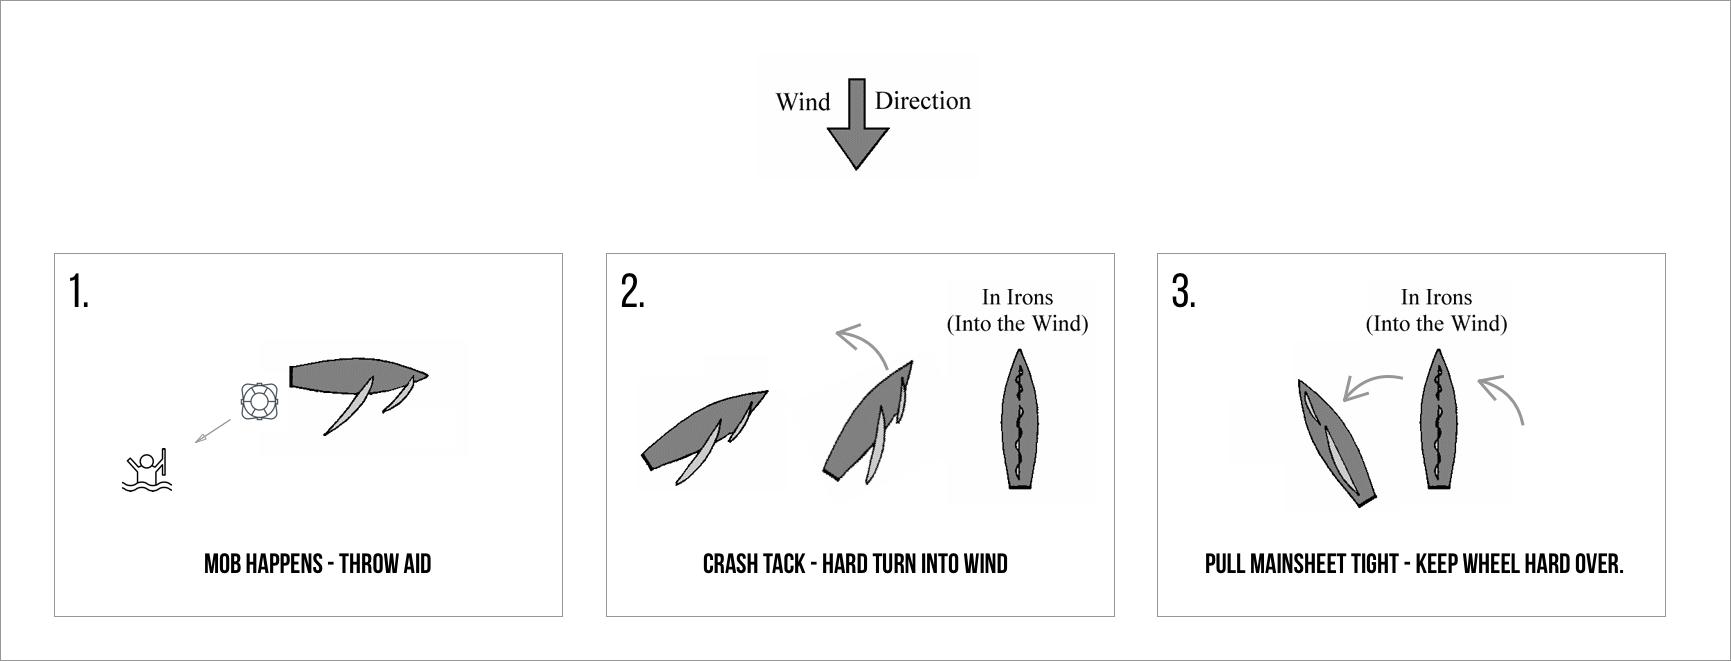 mob-steps-diagram.png